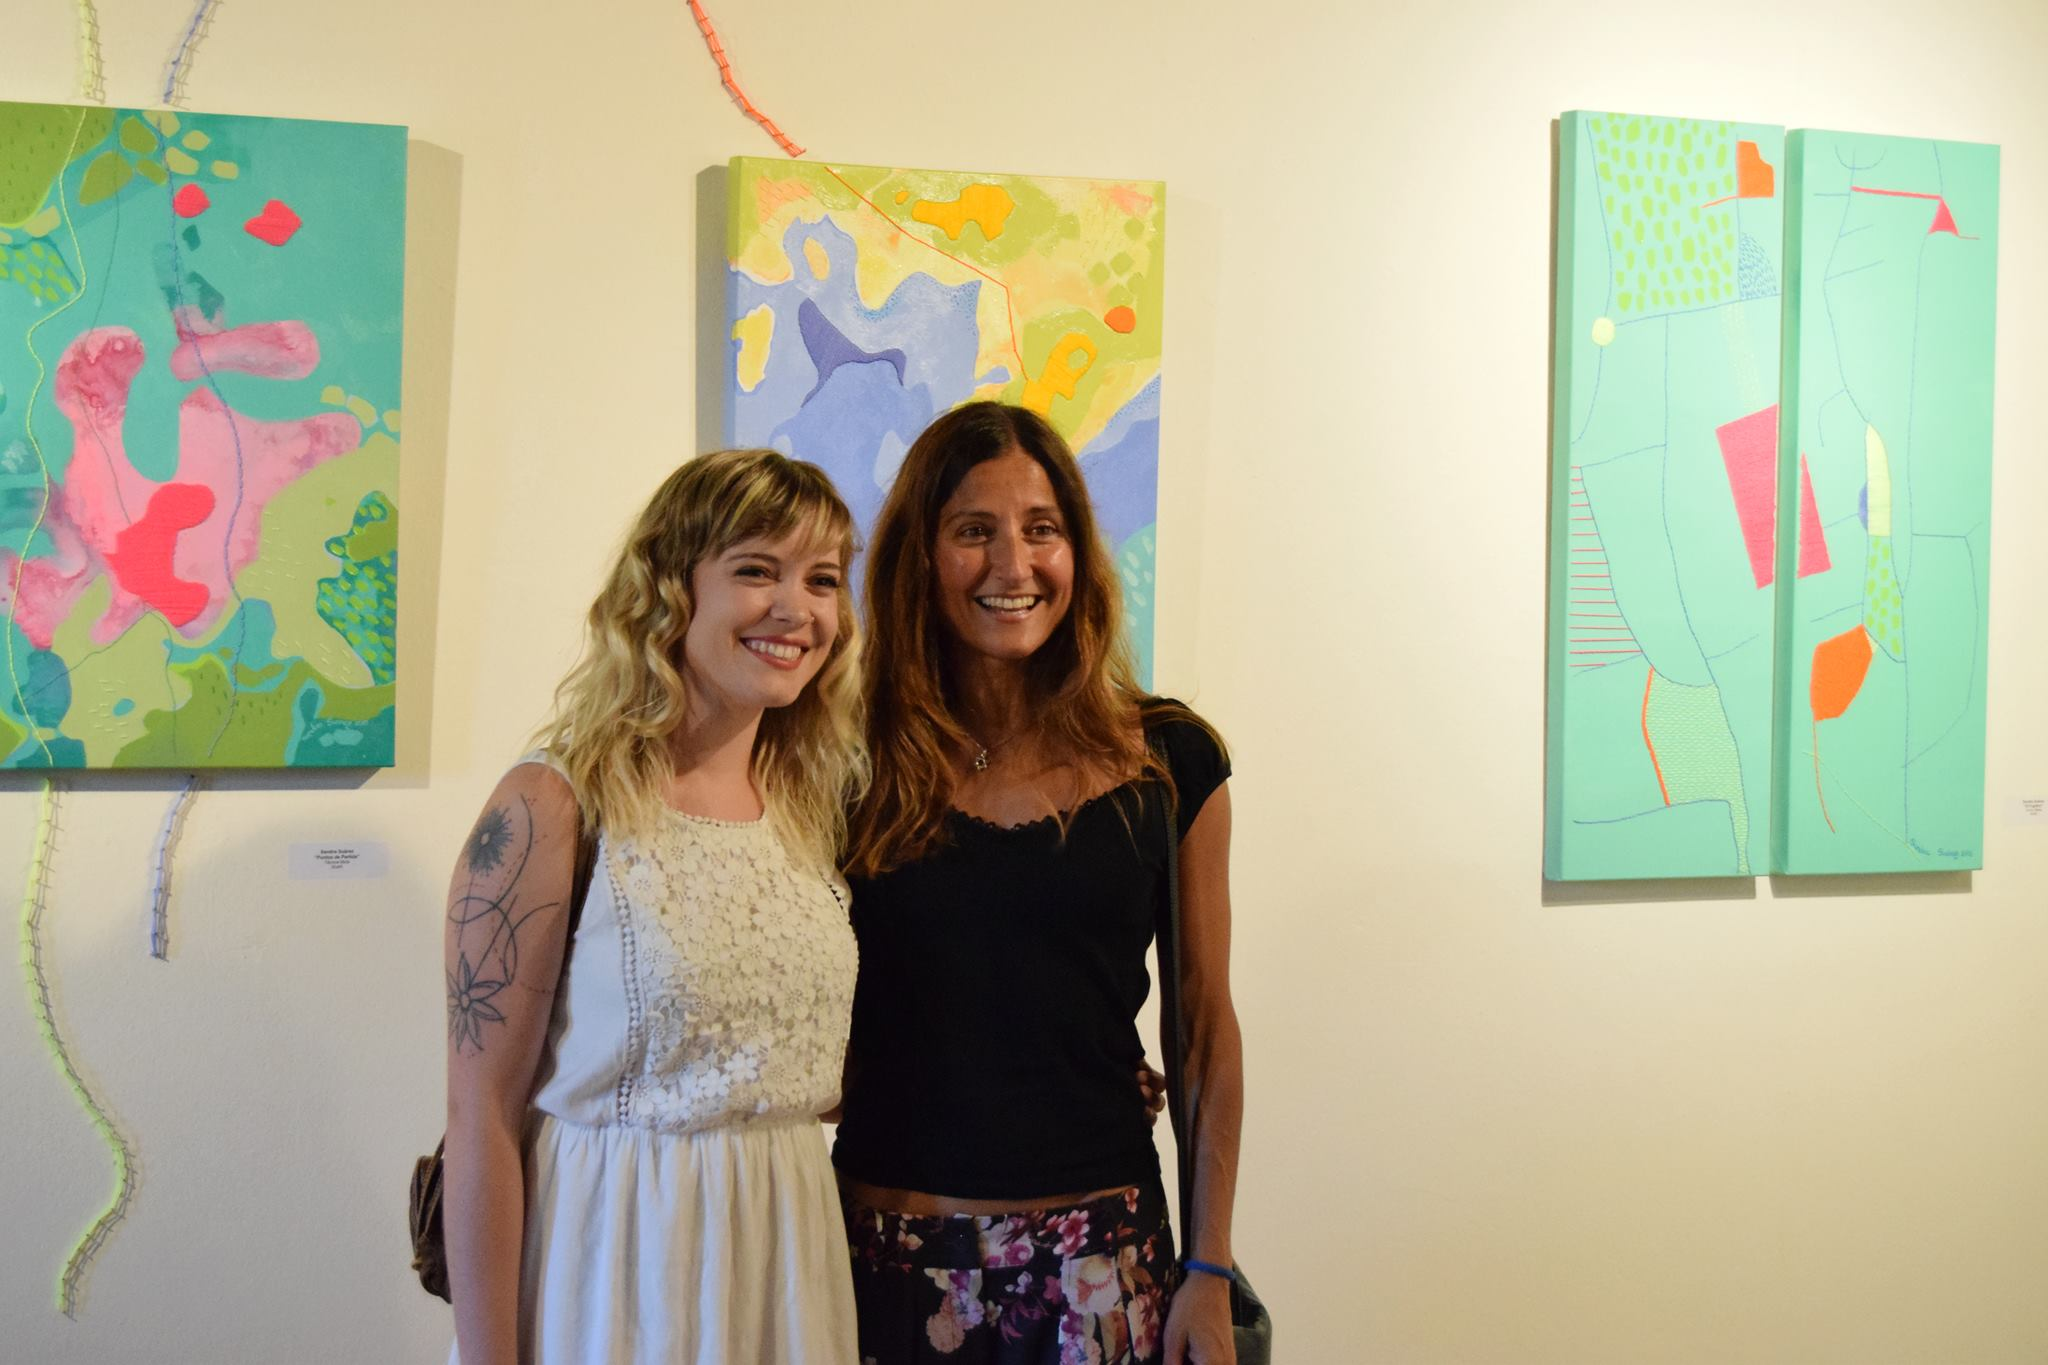 sandra suarez artedemirar y Sonia Piñeiro